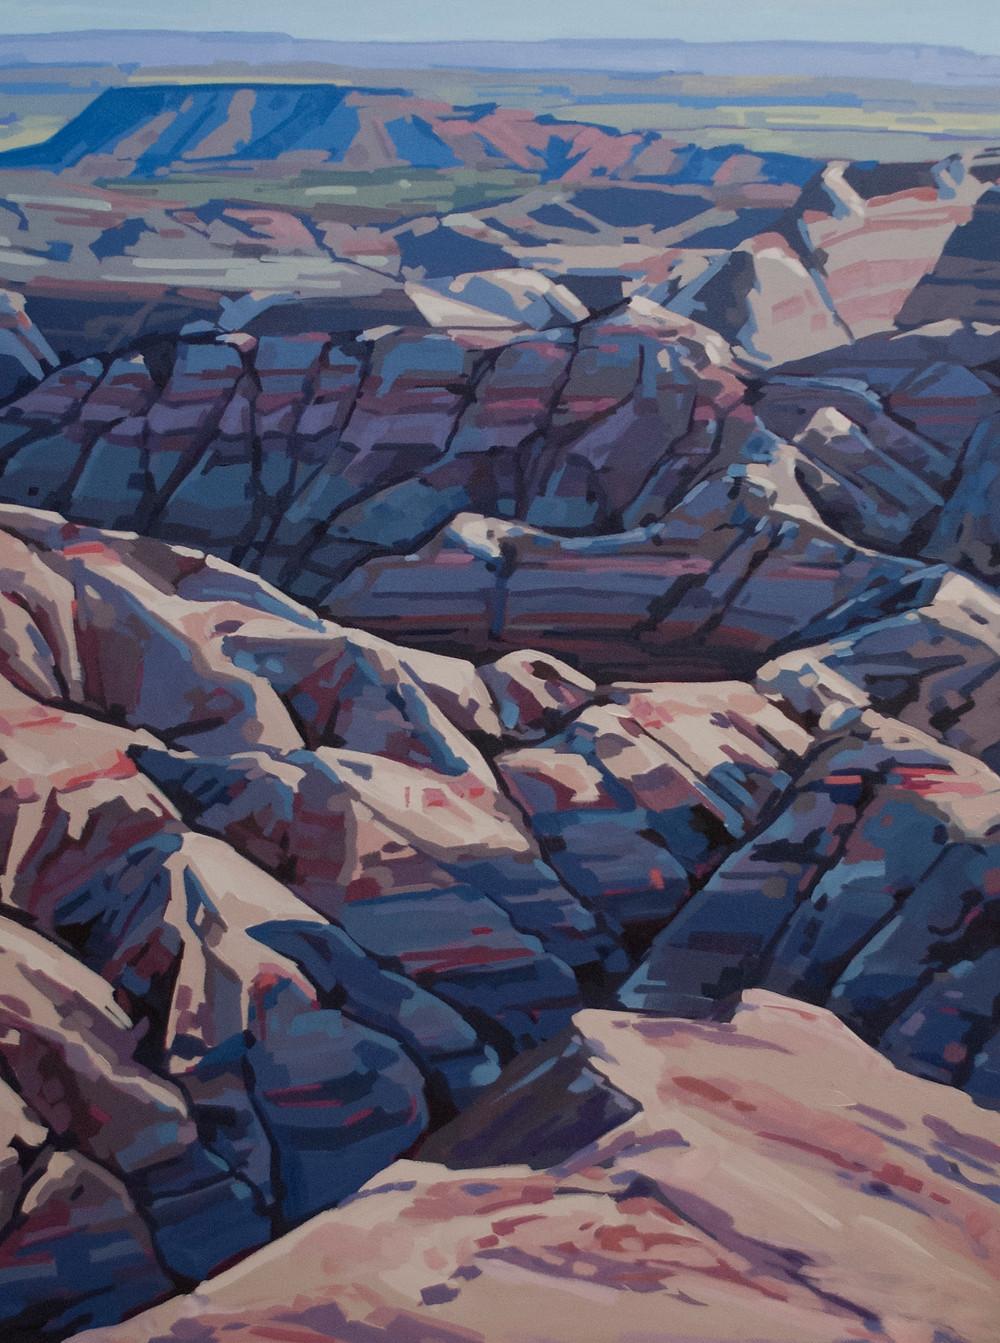 big foot pass badlands painting ostrowski